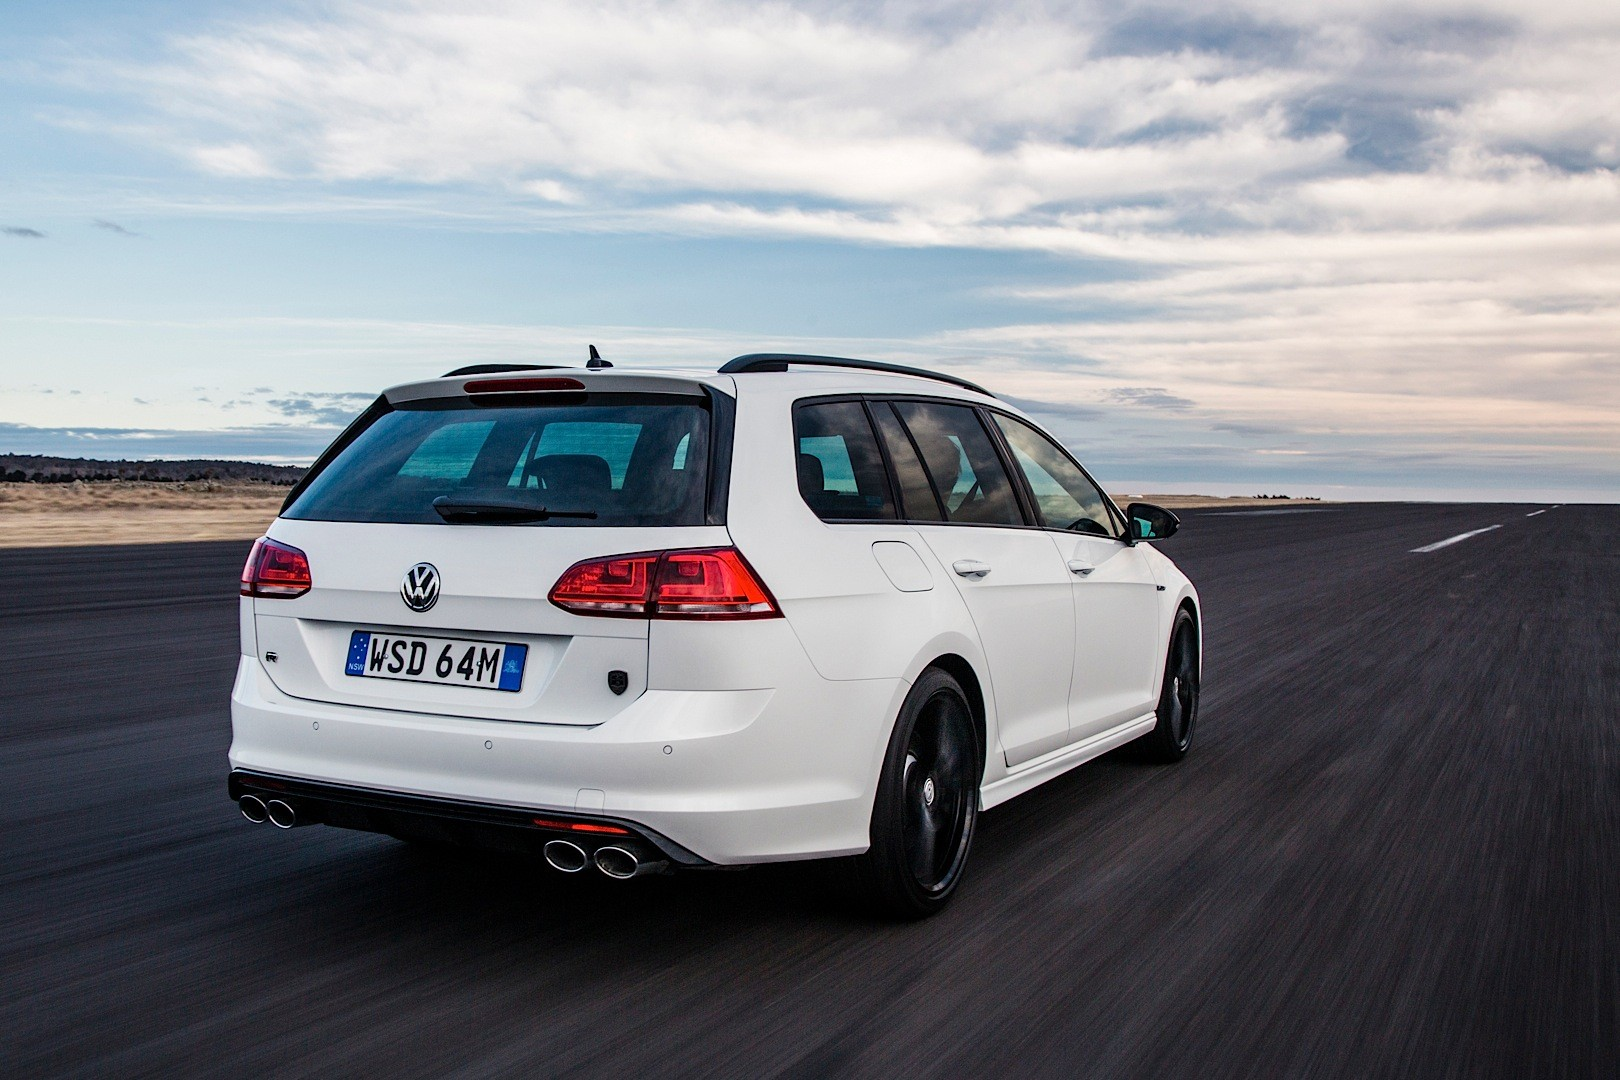 Volkswagen Cars - News: VW introduces Wolfsburg Edition on Golf R